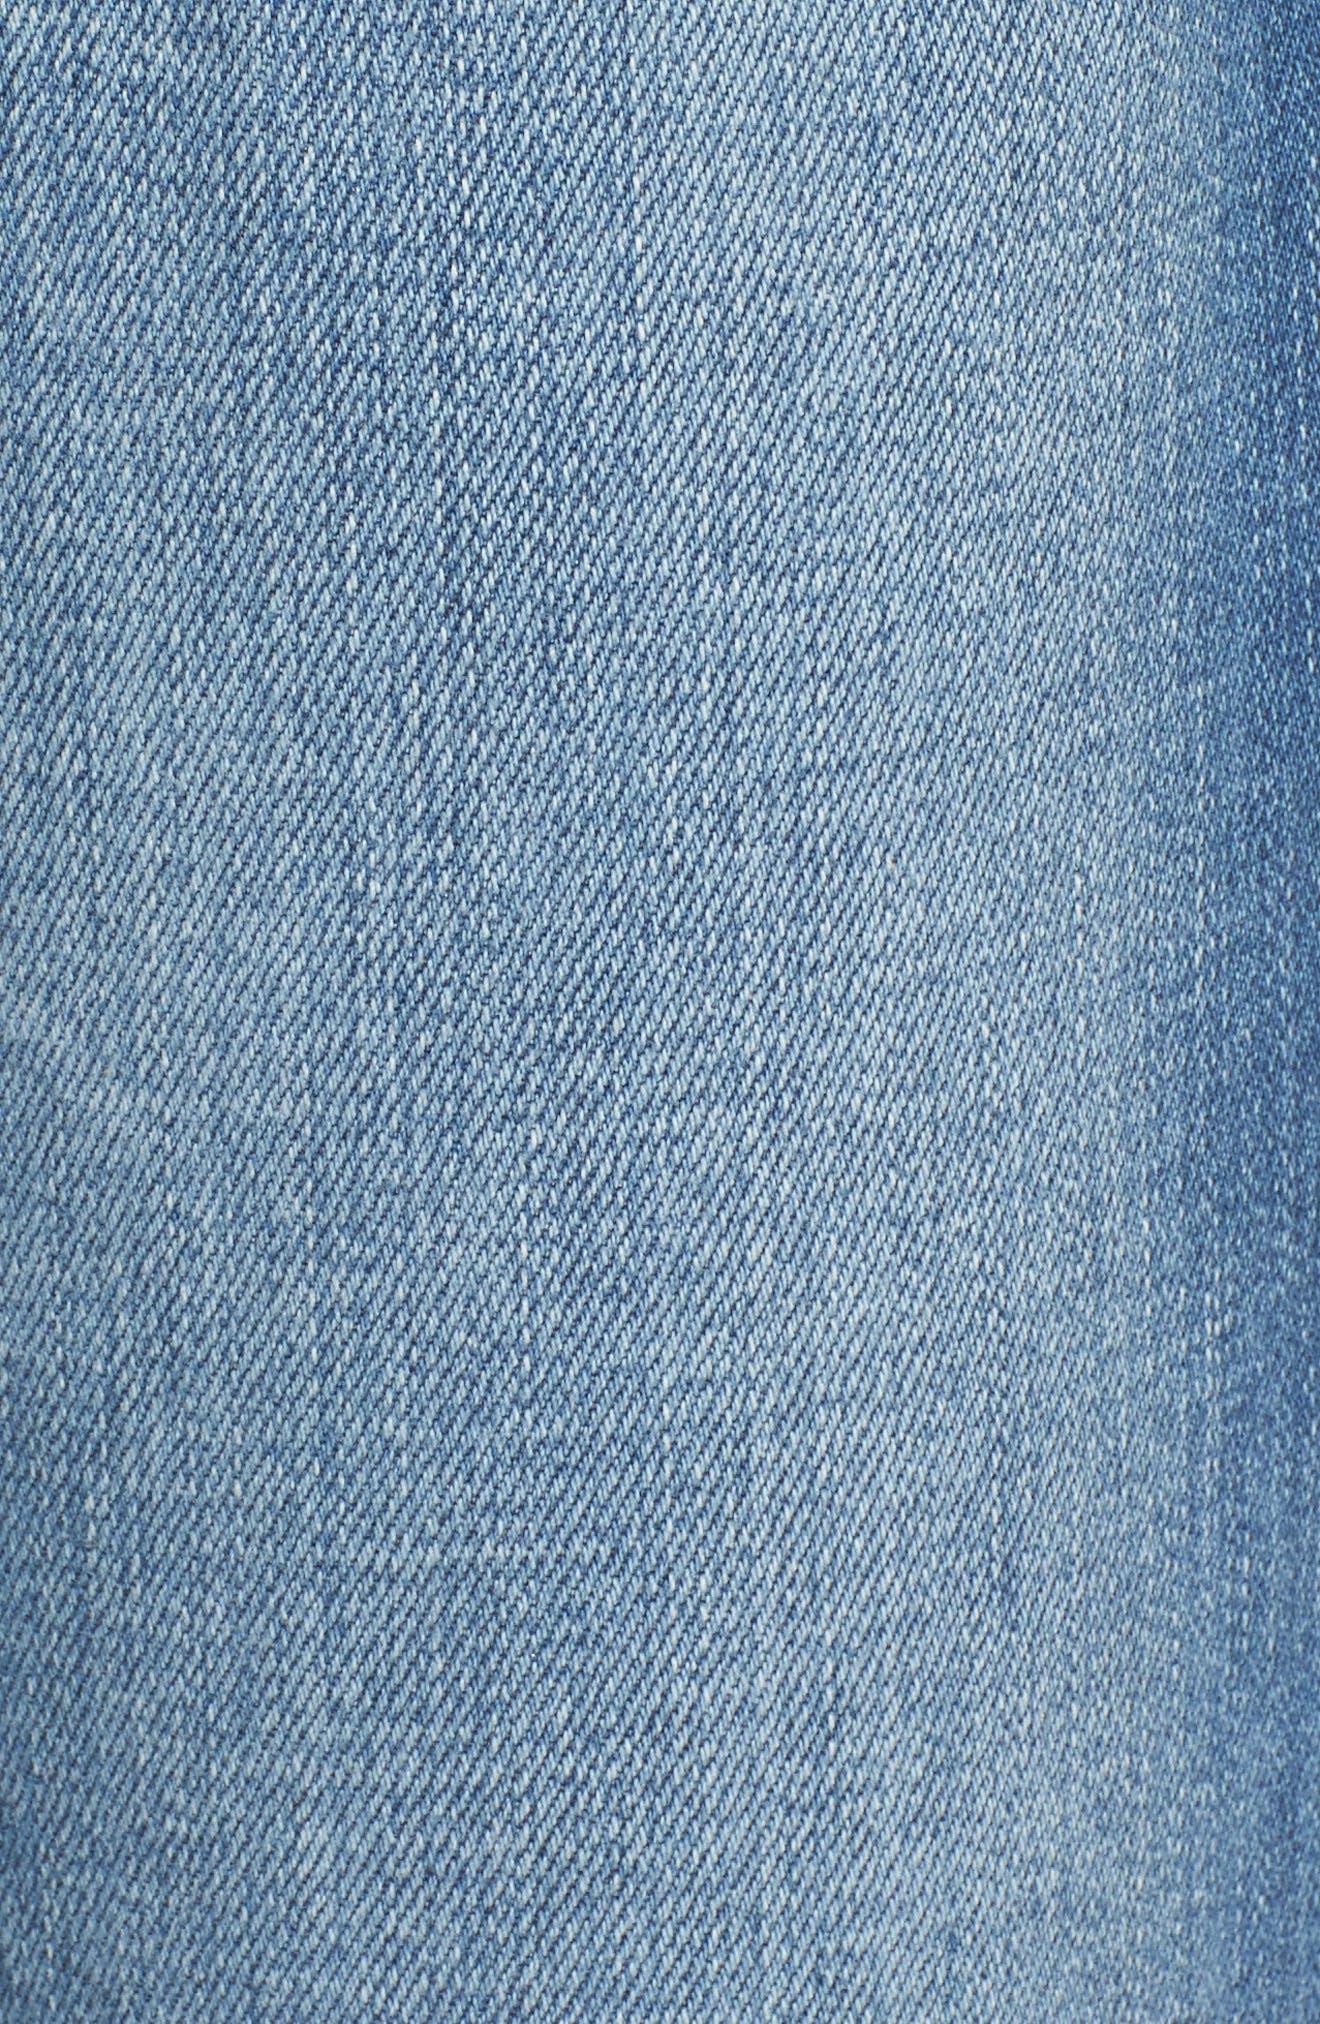 Alternate Image 6  - FRAME Le Boy Zip Hem Crop Jeans (Picadilly) (Nordstrom Exclusive)